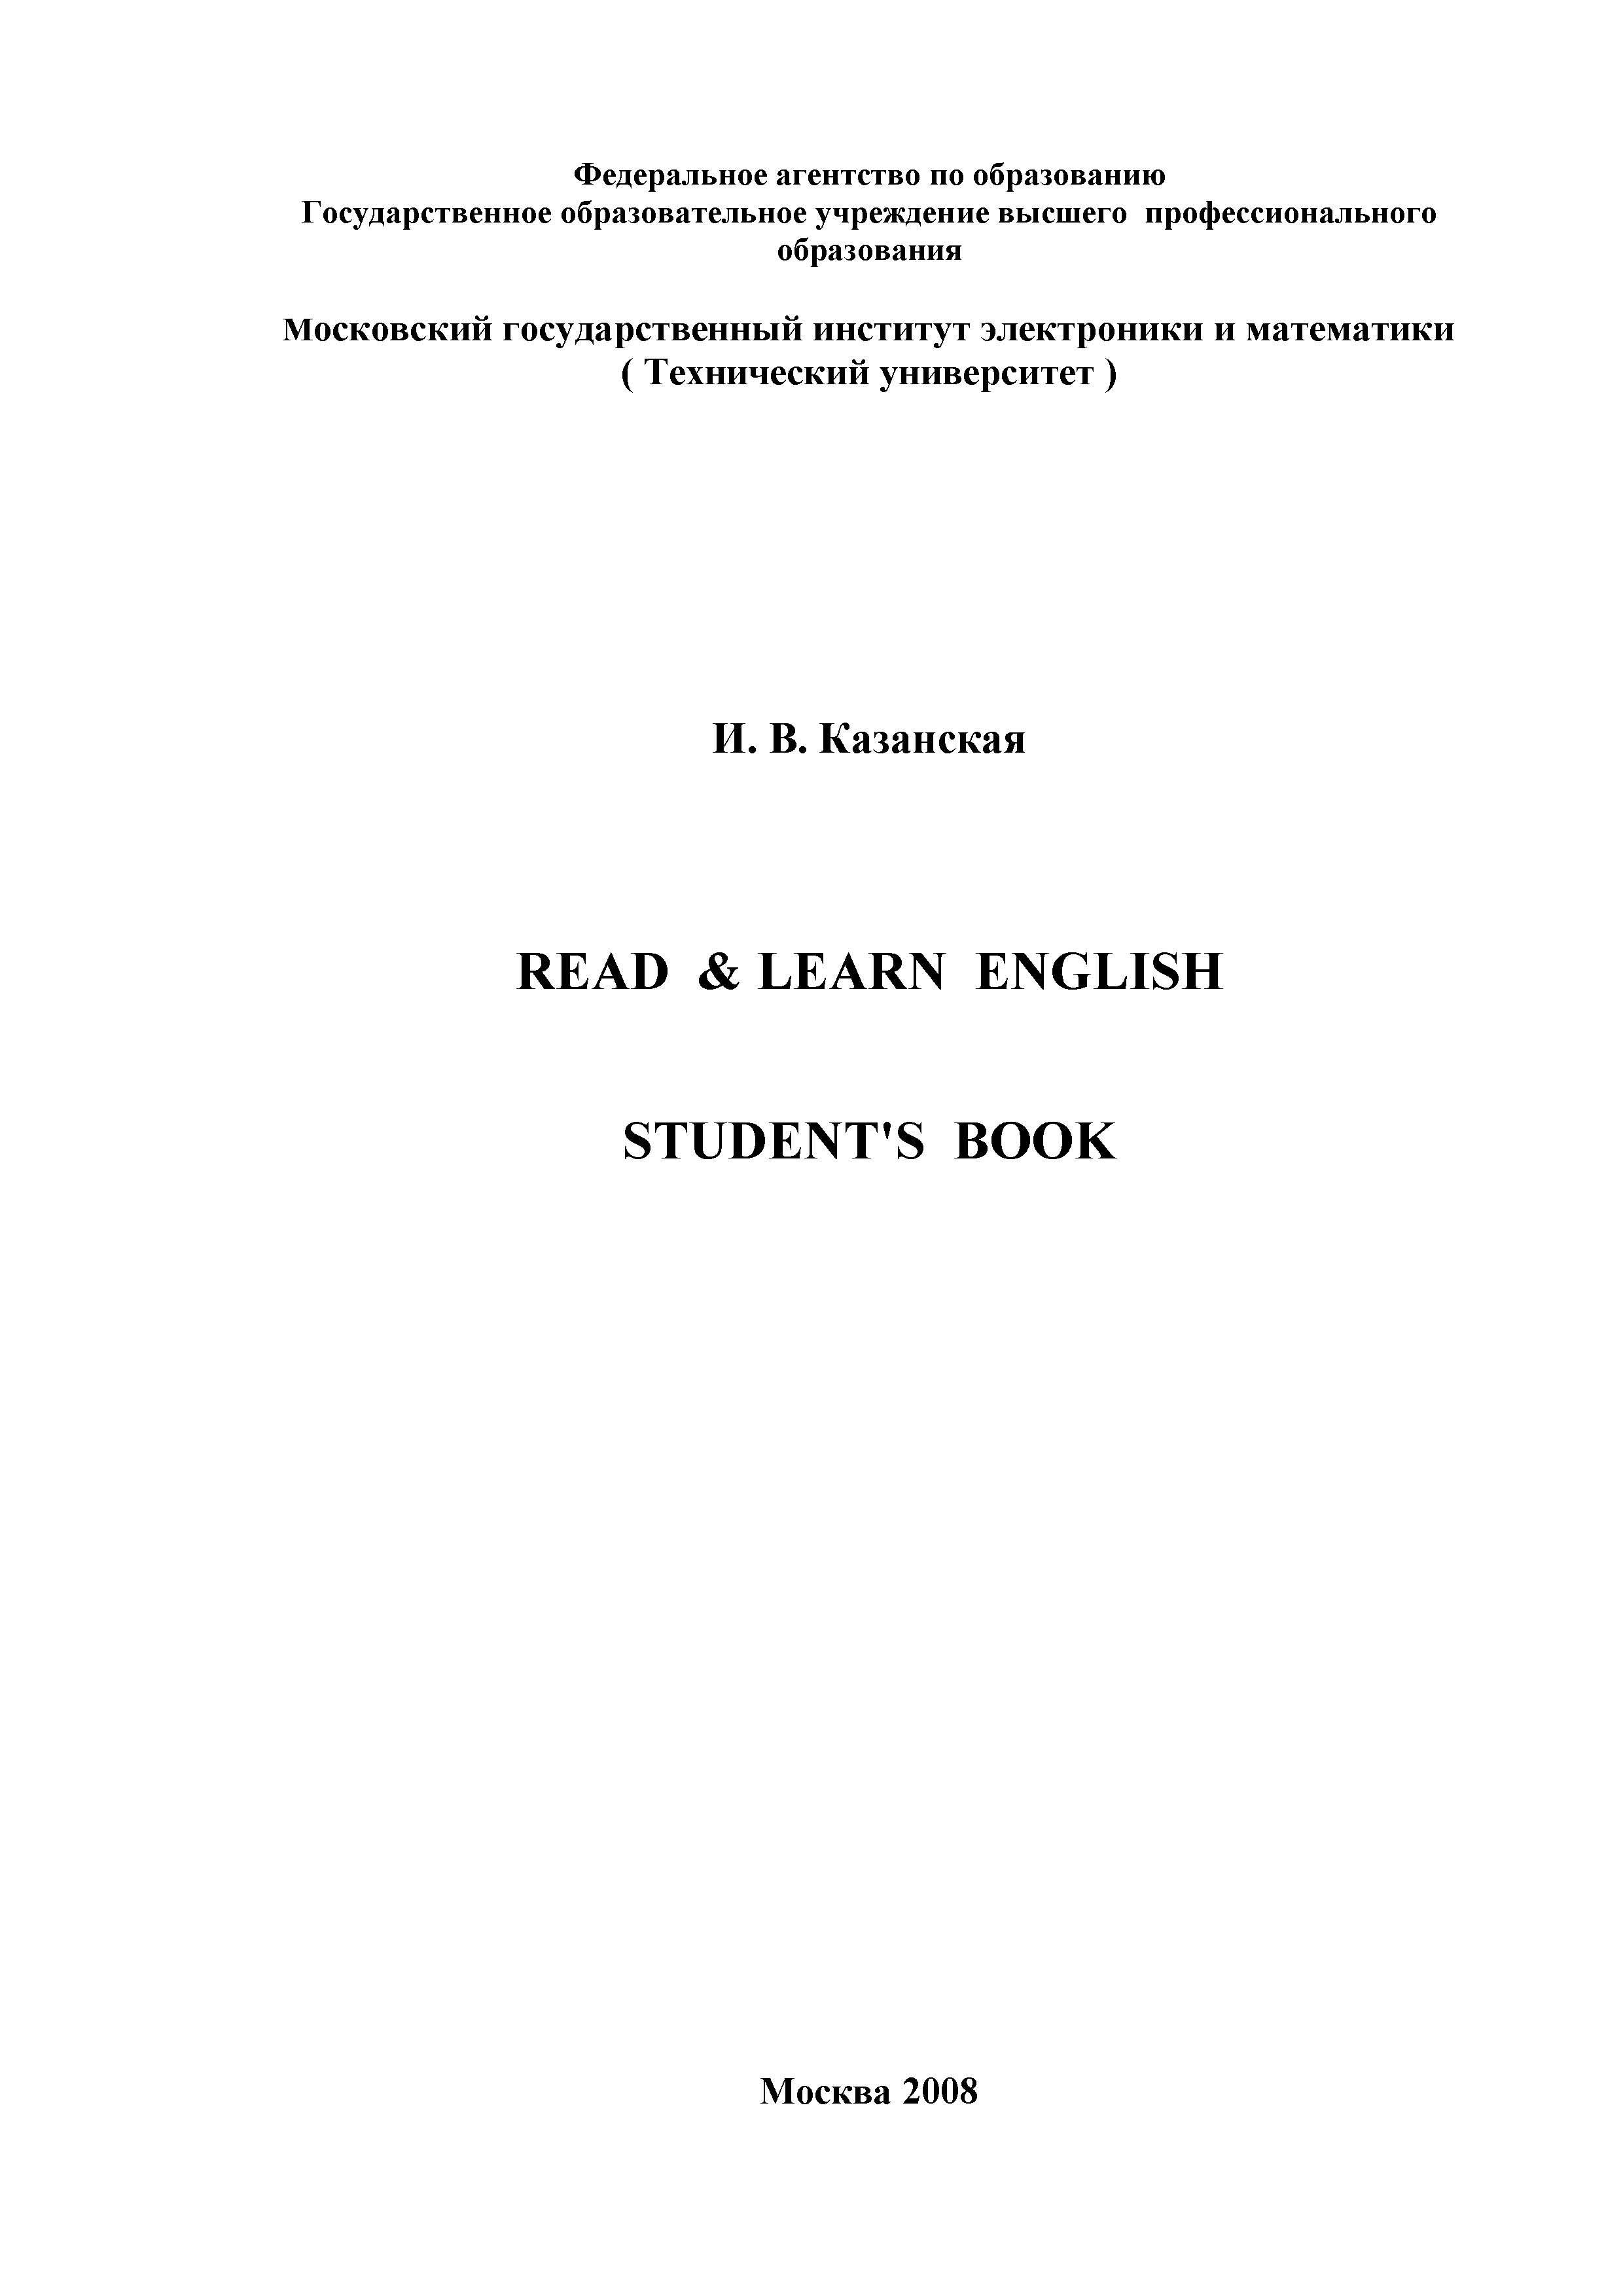 Read & Learn English. Student's Book: Учебное пособие